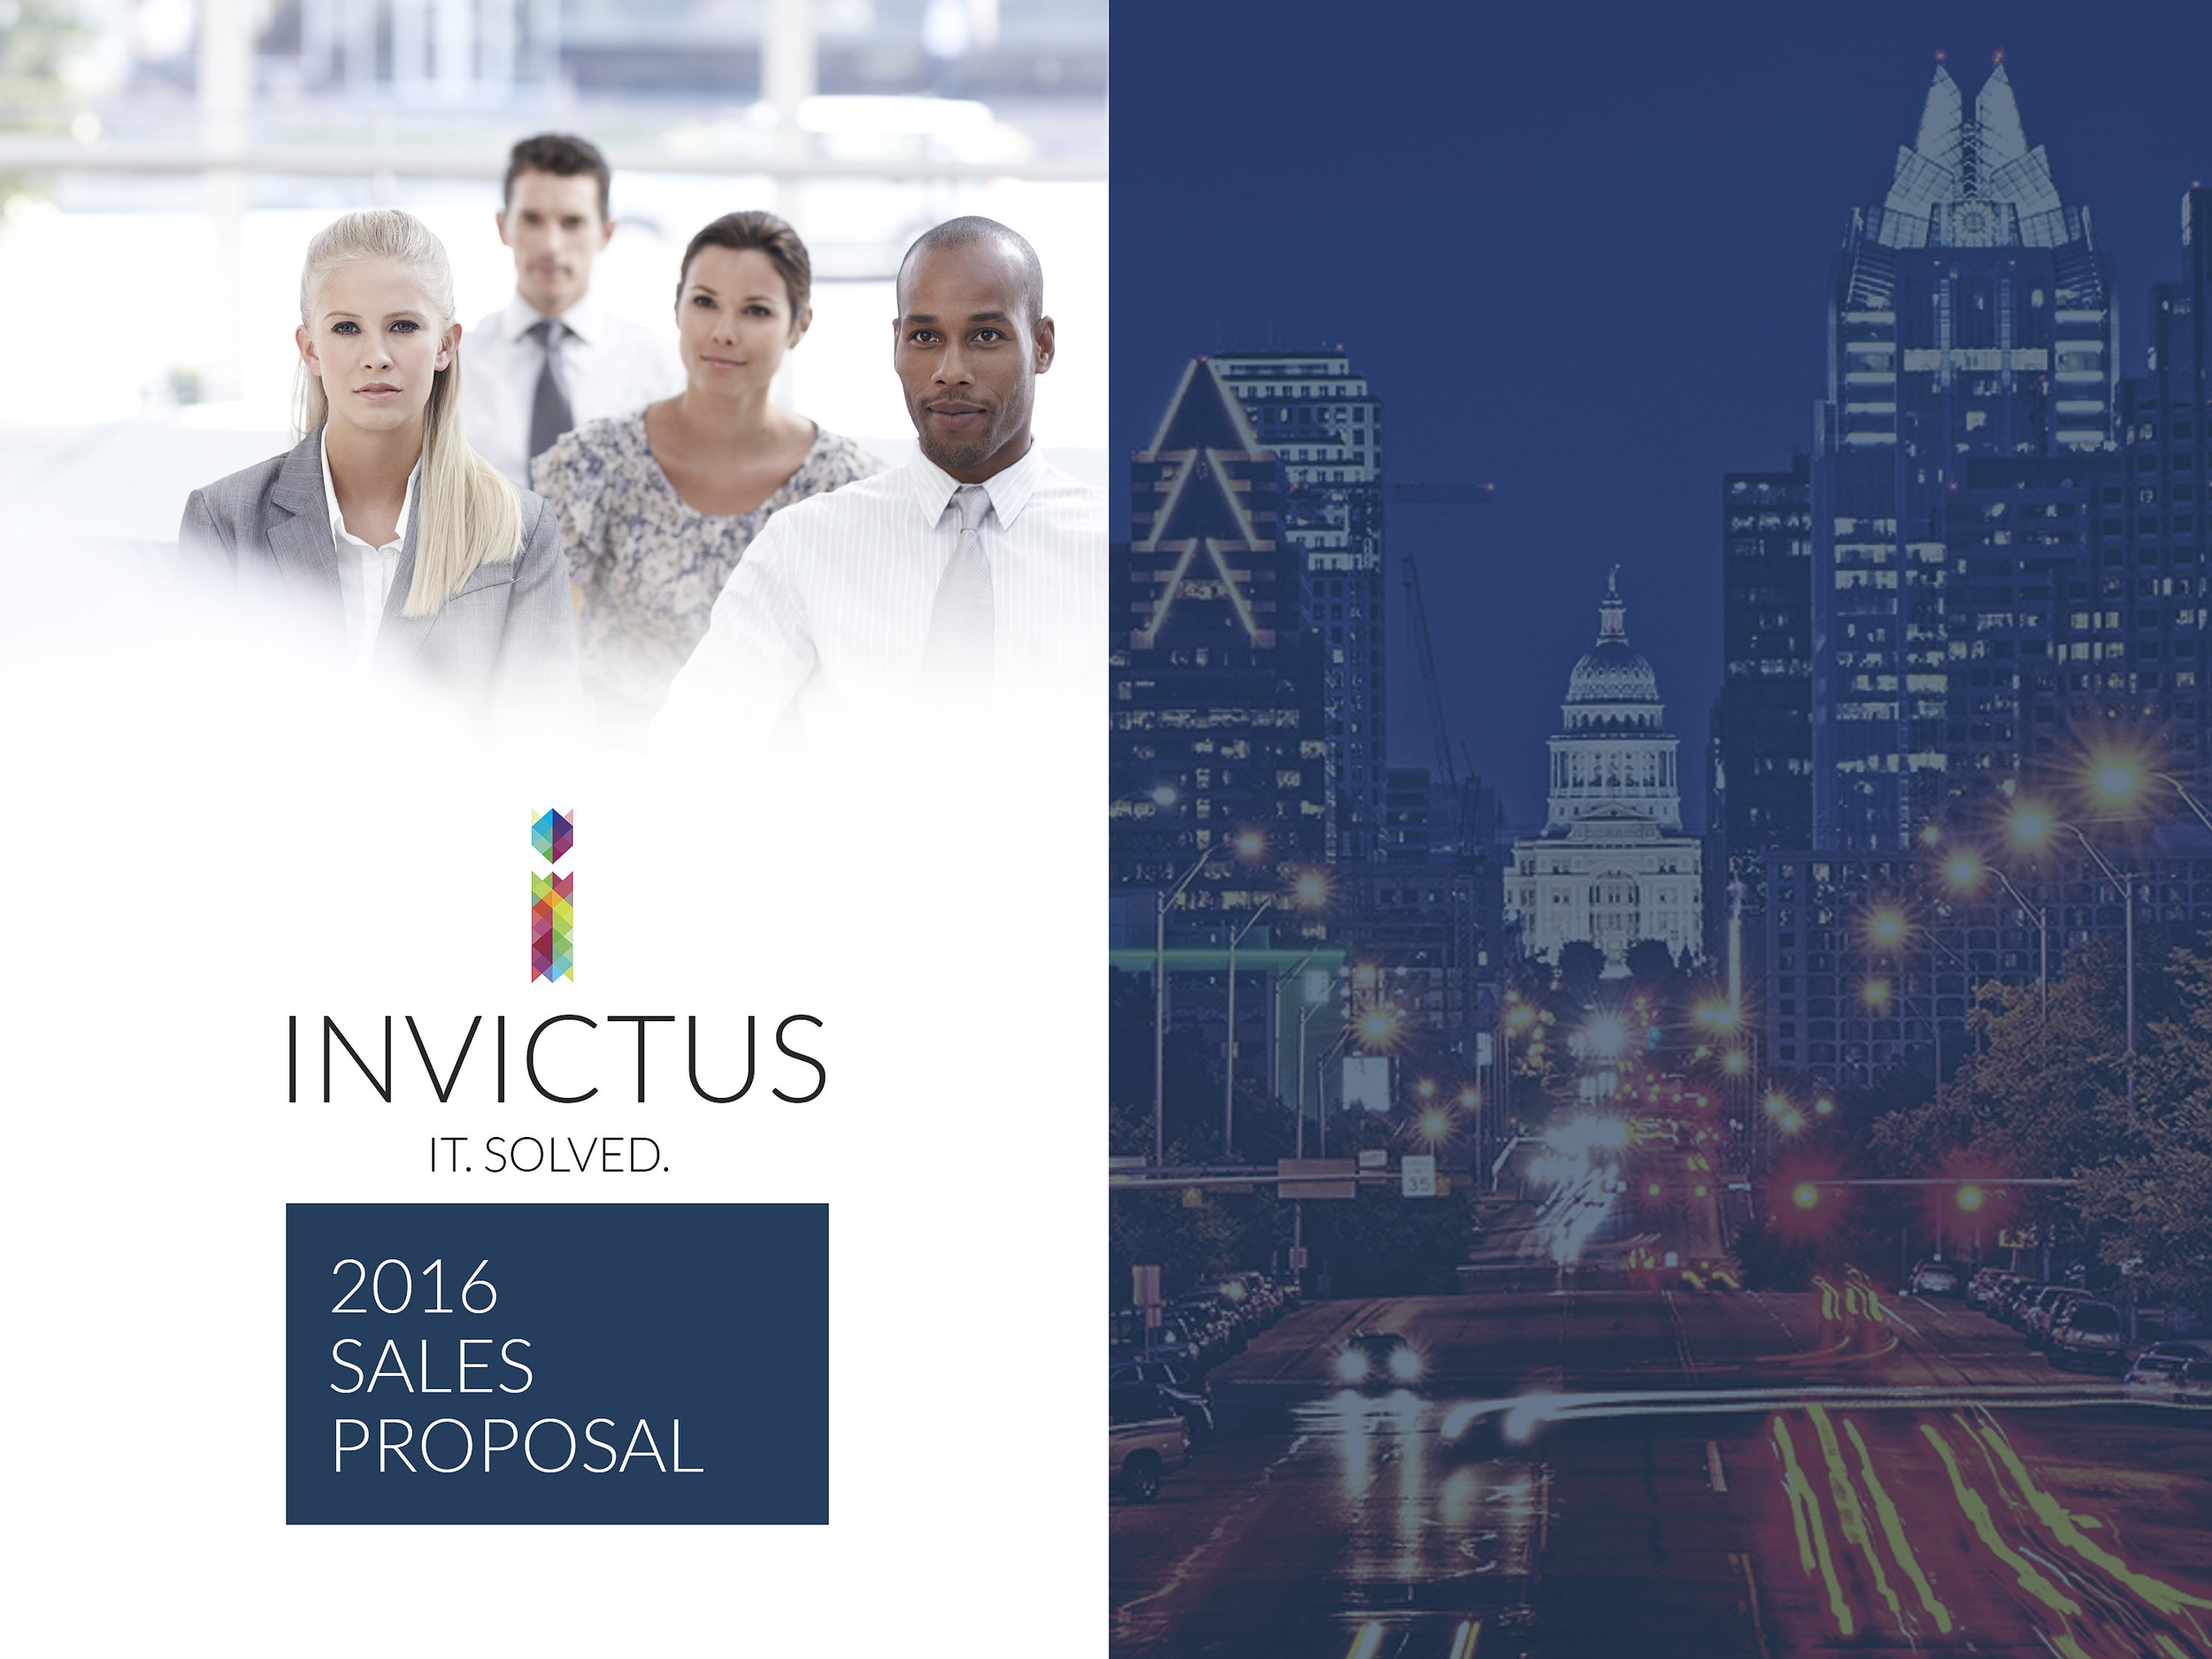 Invictus_PowerPoint1.jpg